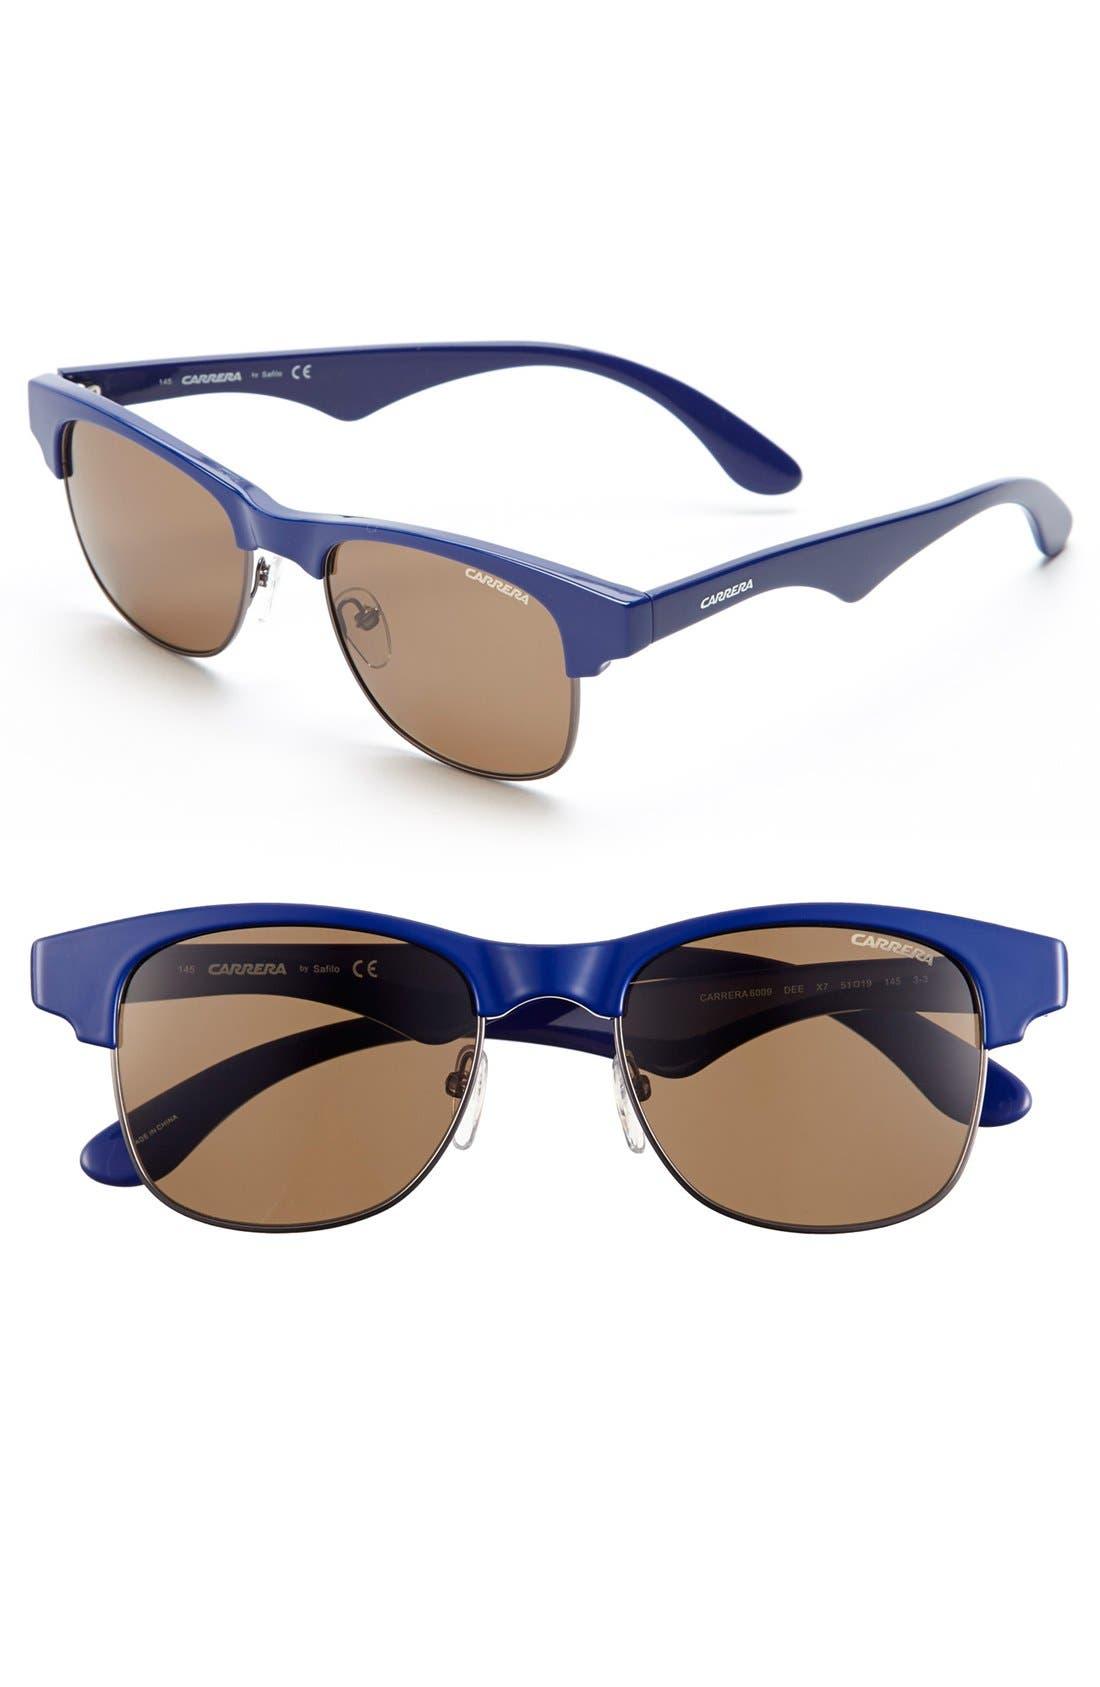 Alternate Image 1 Selected - Carrera Eyewear 51mm Browline Sunglasses